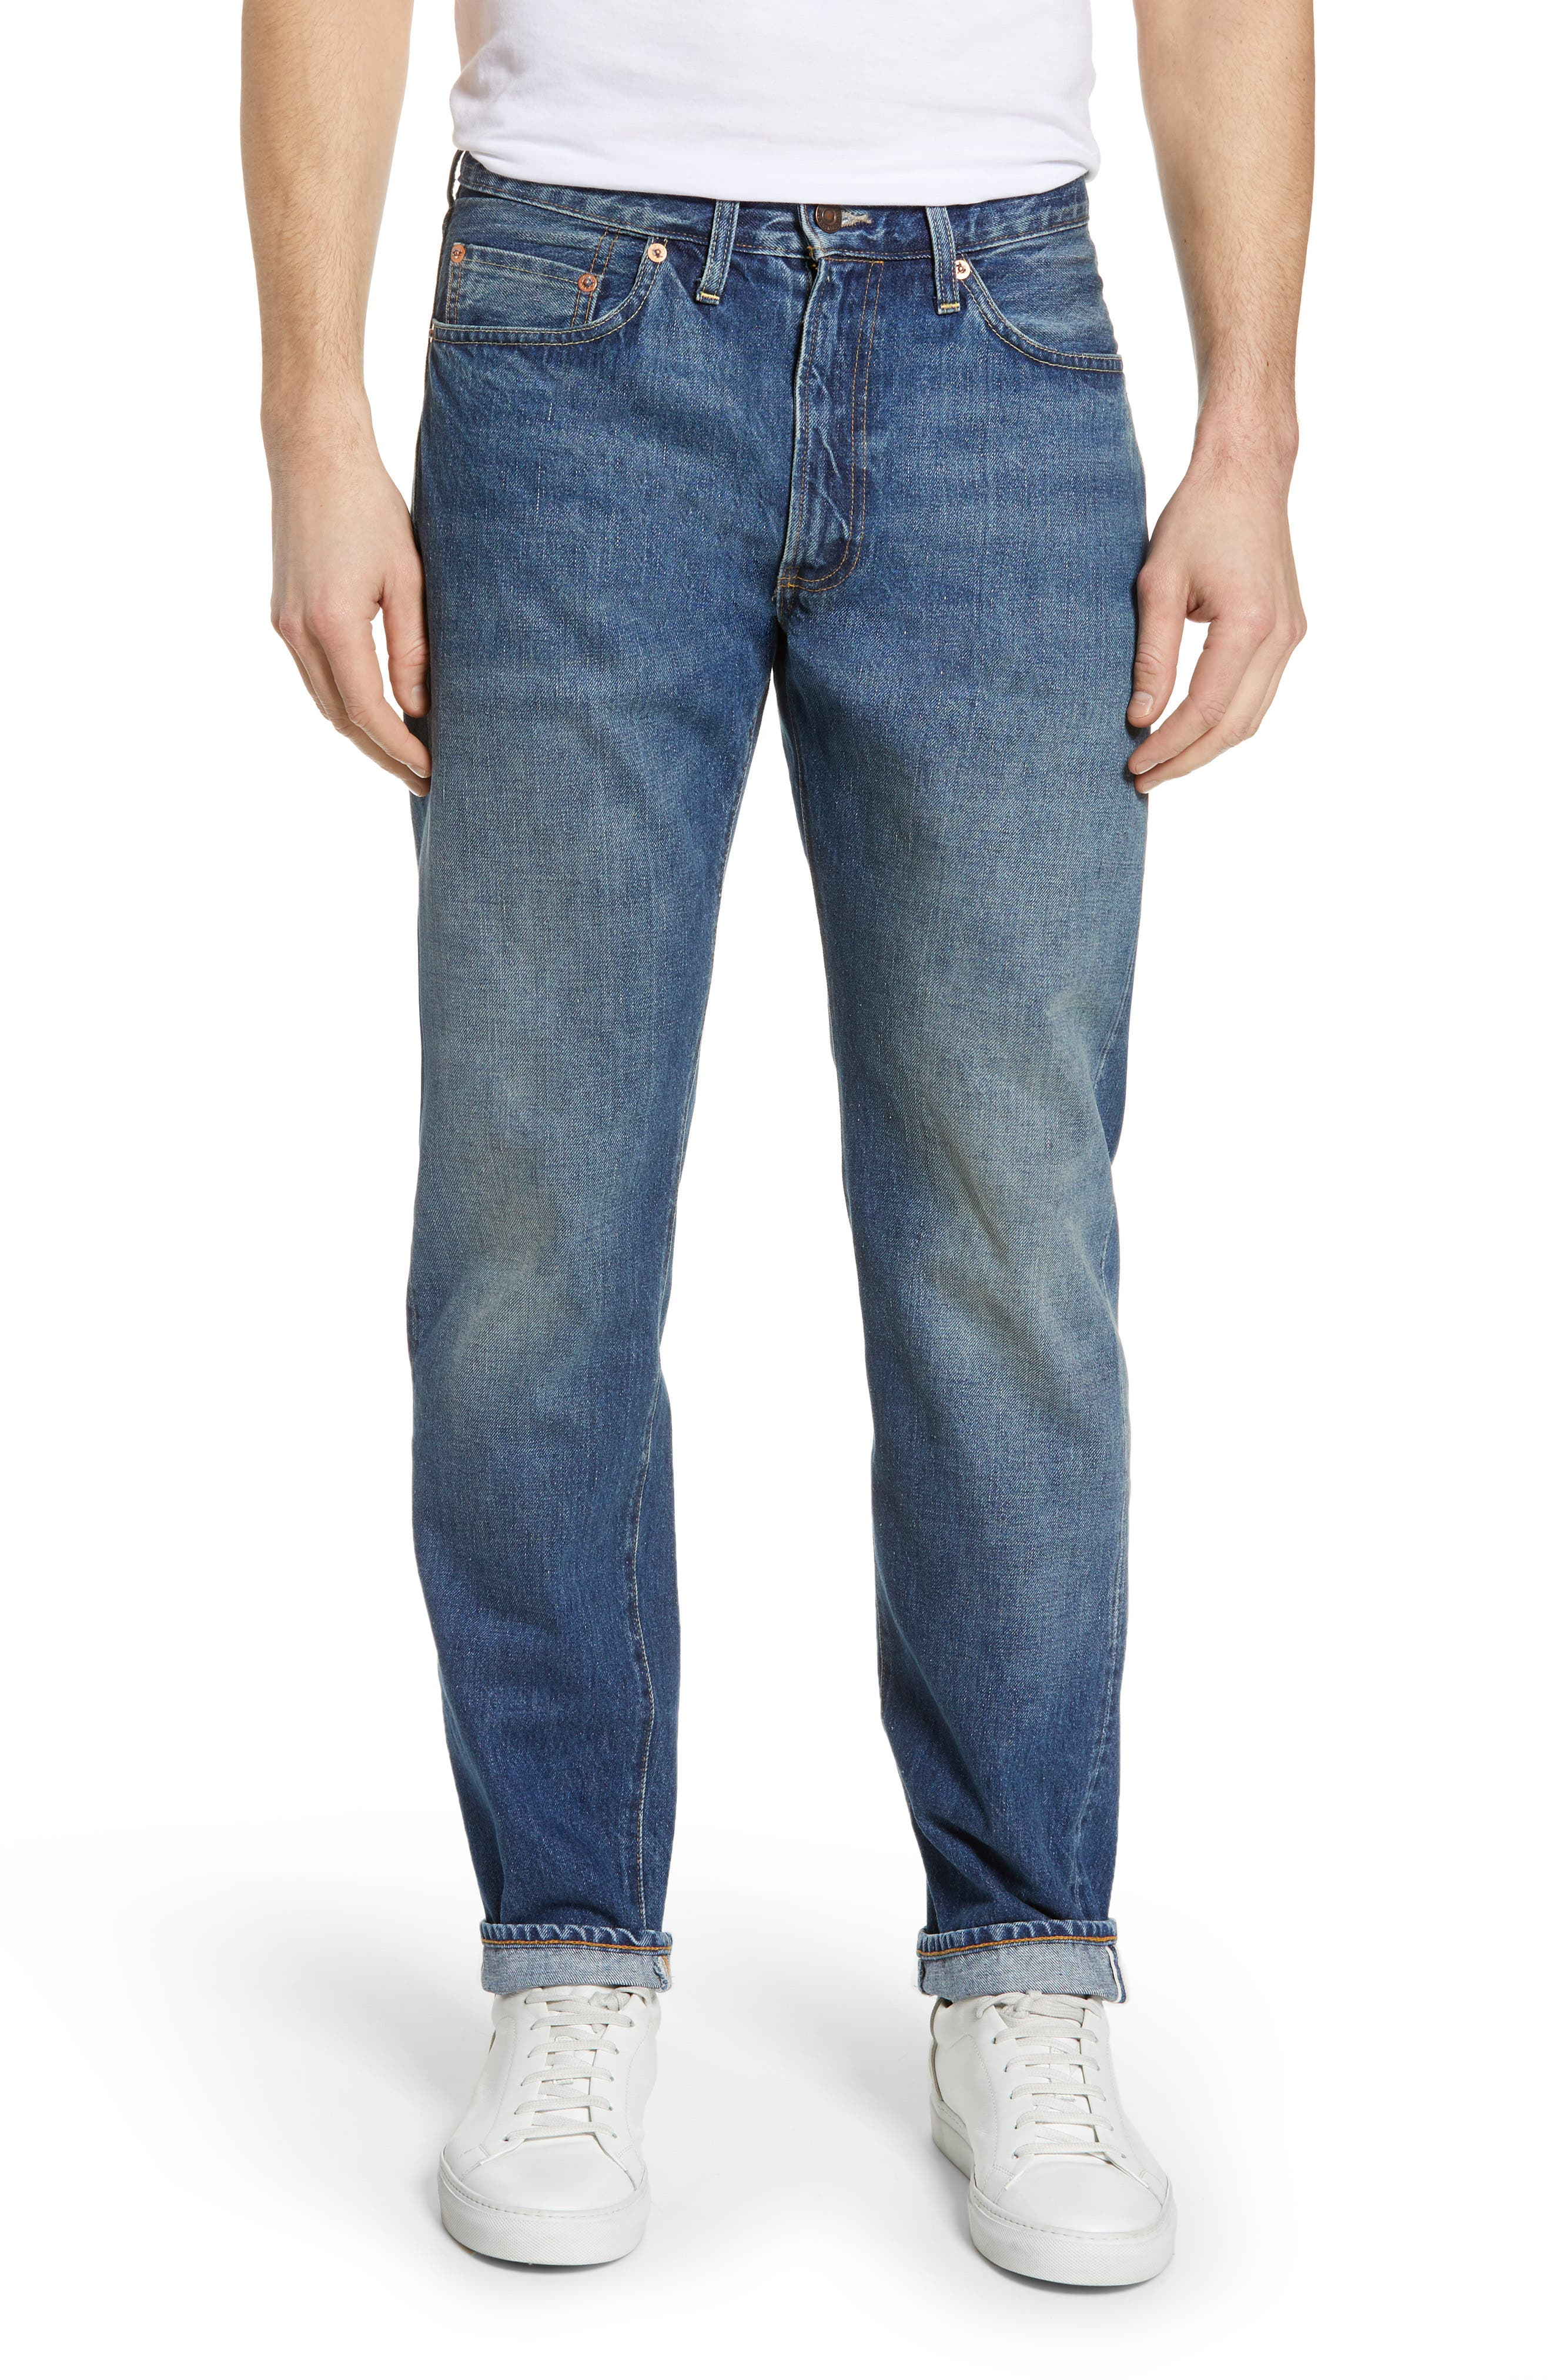 LEVI'S<SUP>®</SUP> VINTAGE CLOTHING 1954 501<sup>®</sup> Straight Leg Jeans, Main, color, PINWHEEL